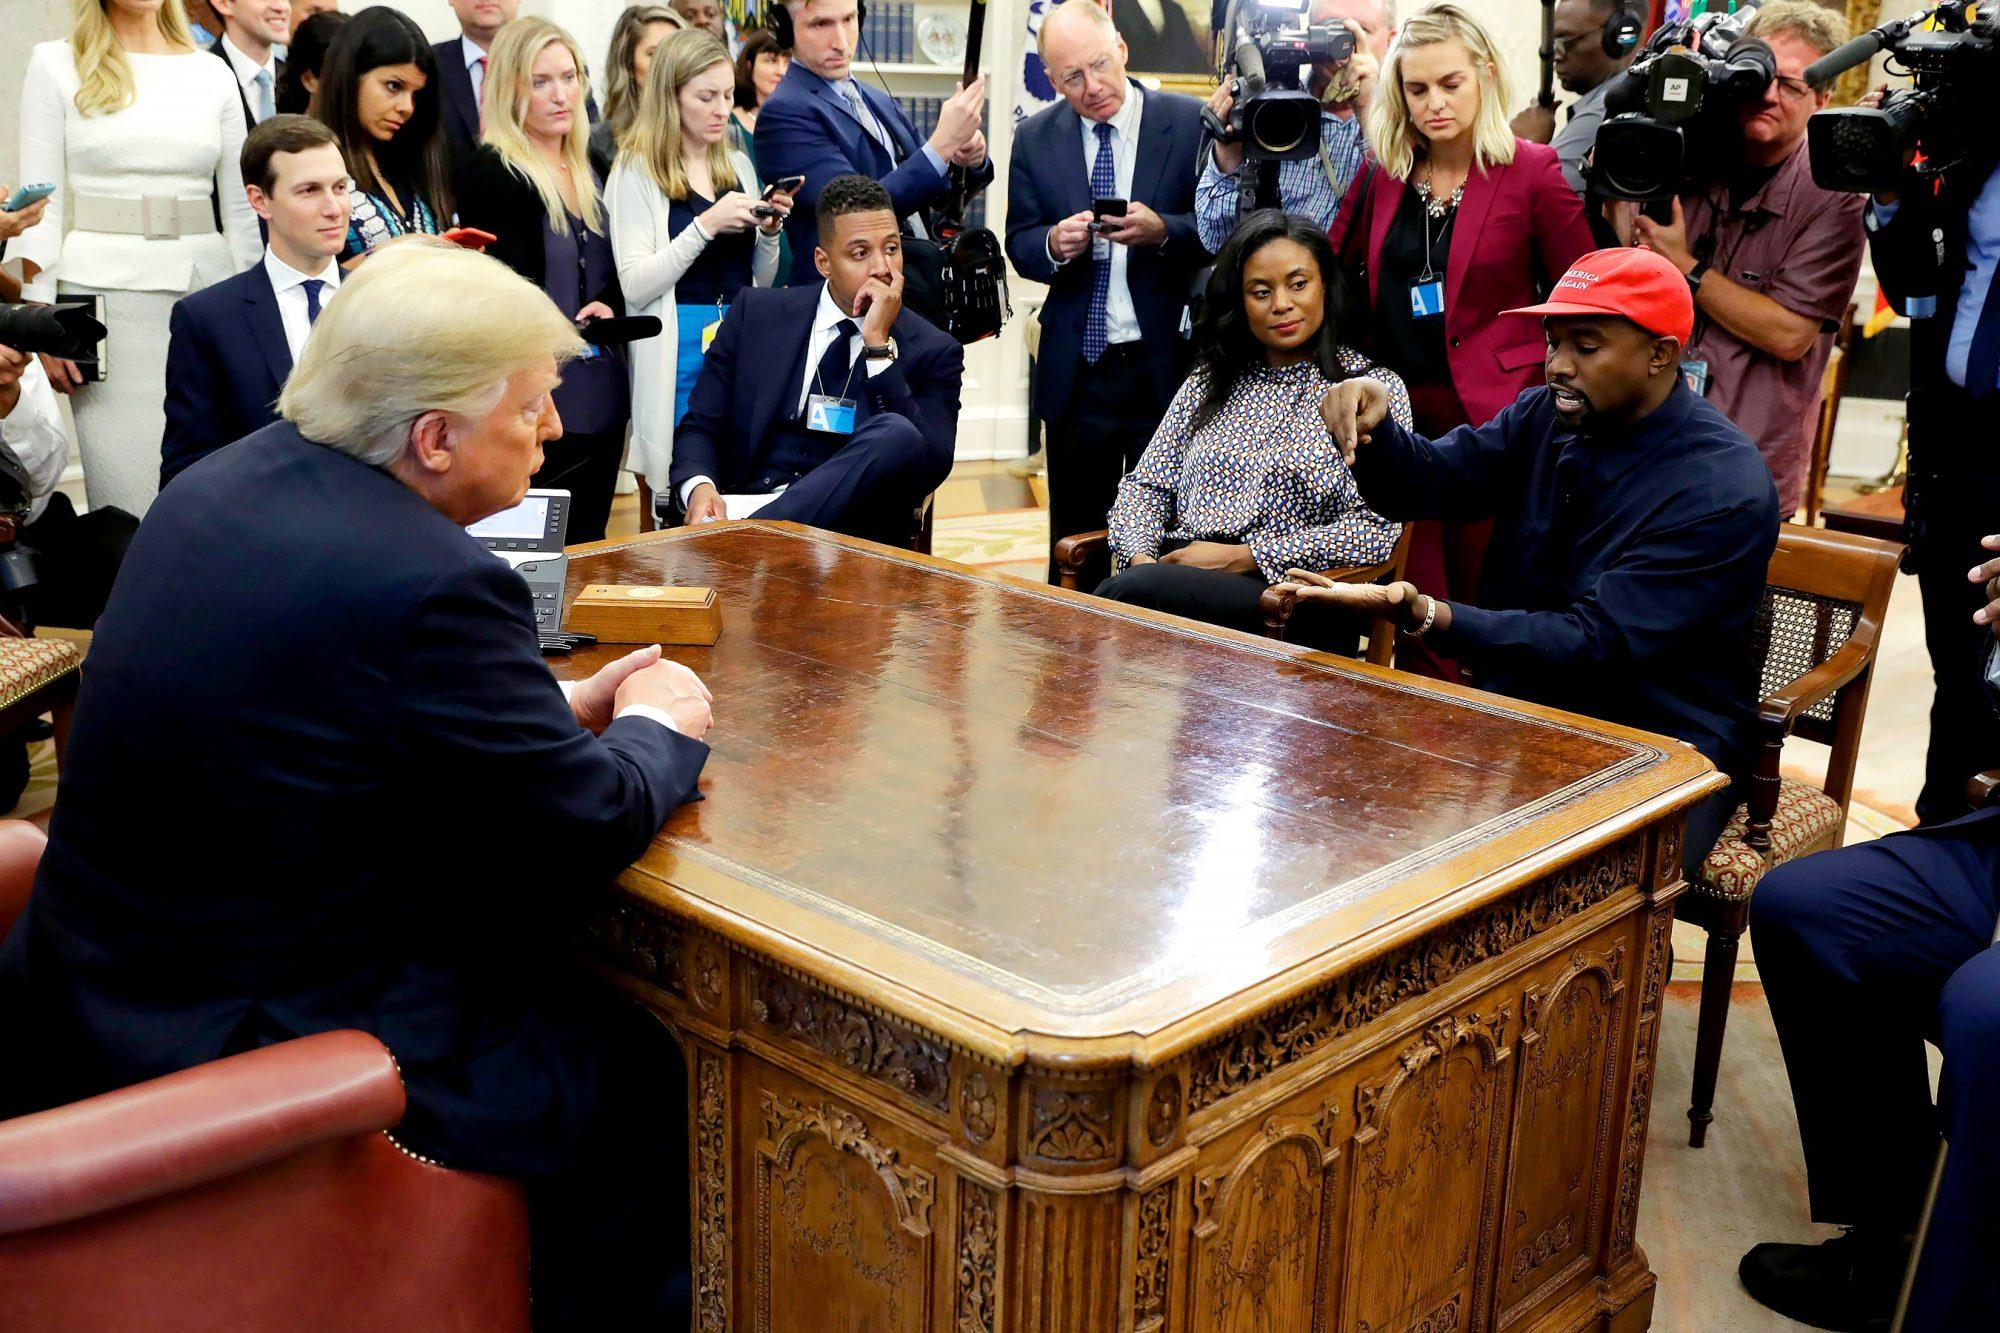 Trump, Washington, USA - 11 Oct 2018